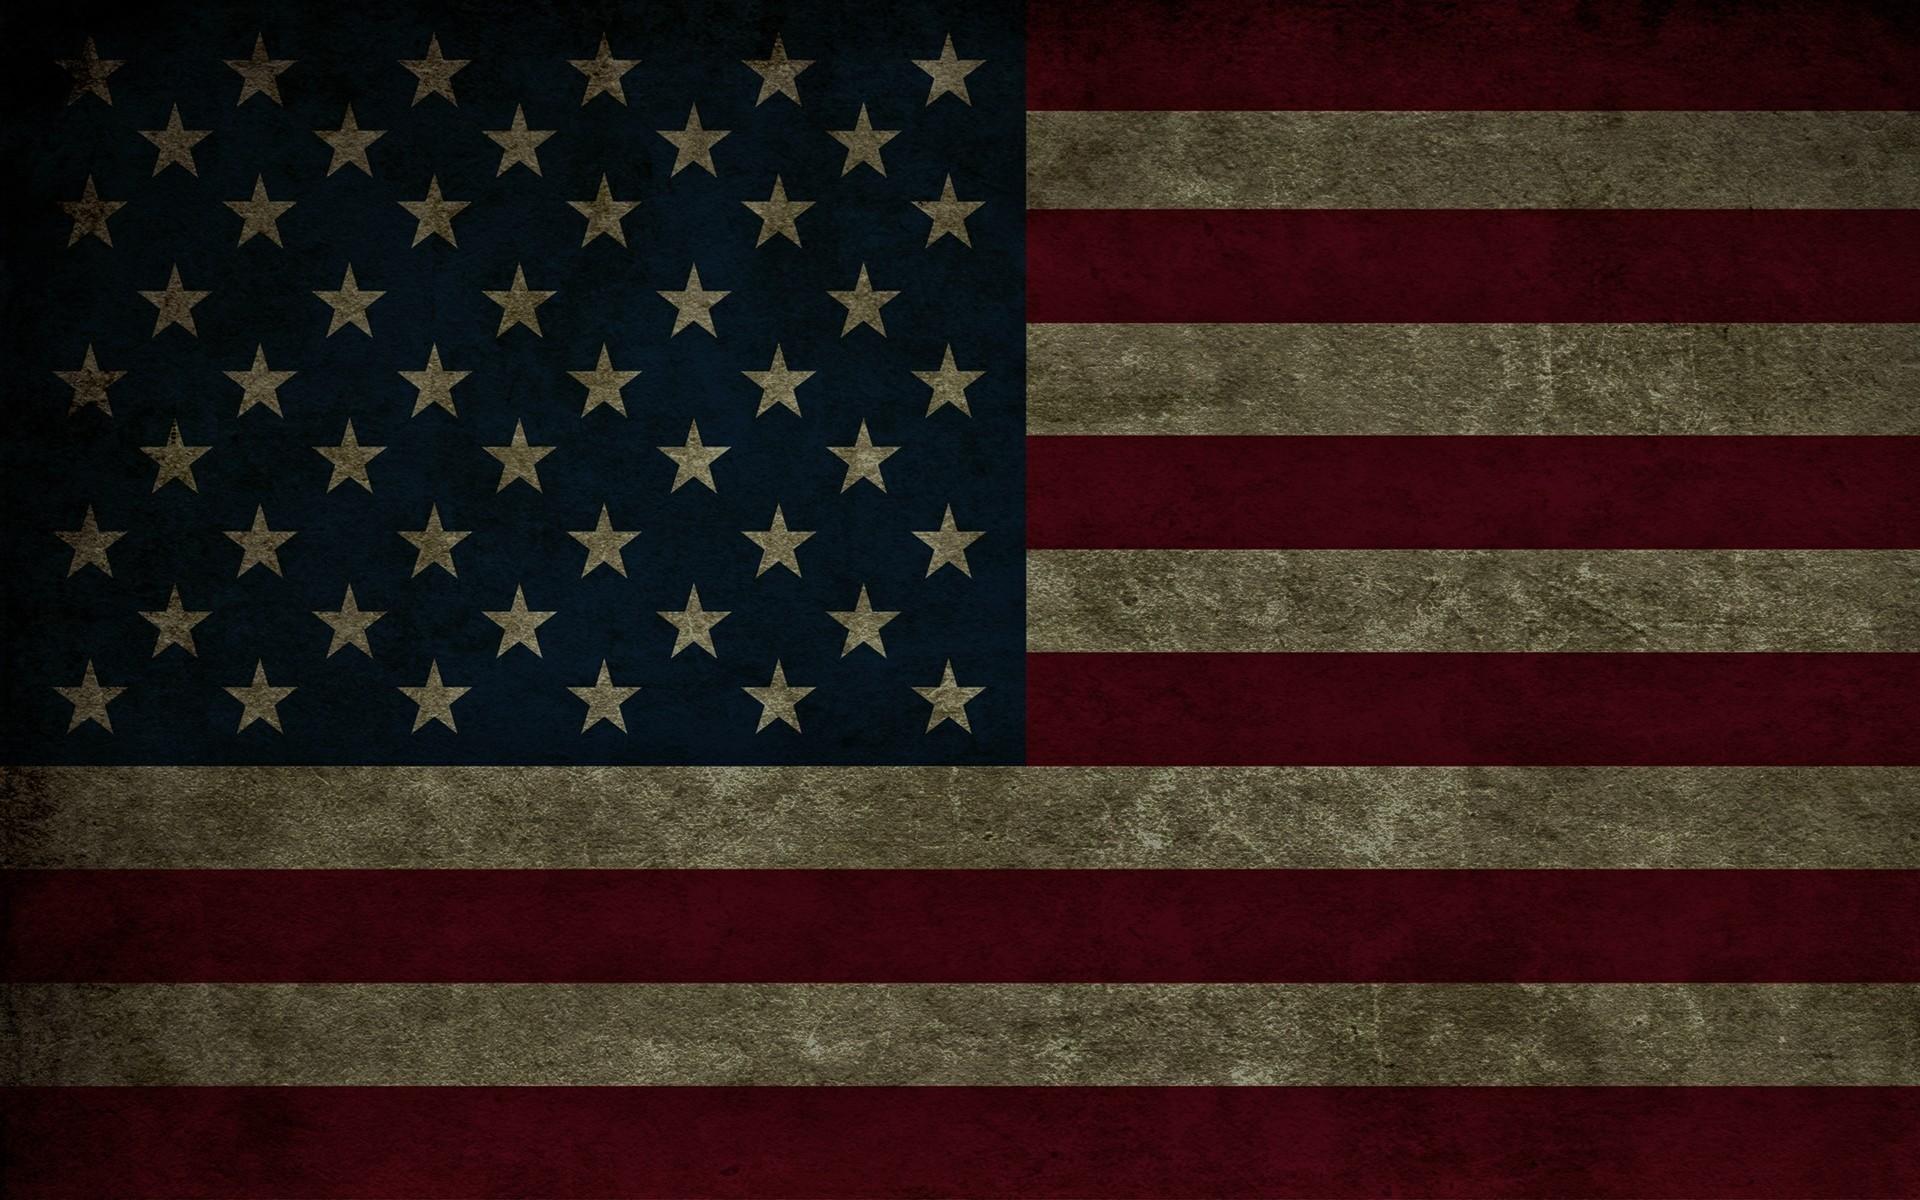 American Flag wallpaper | wallpaper free download